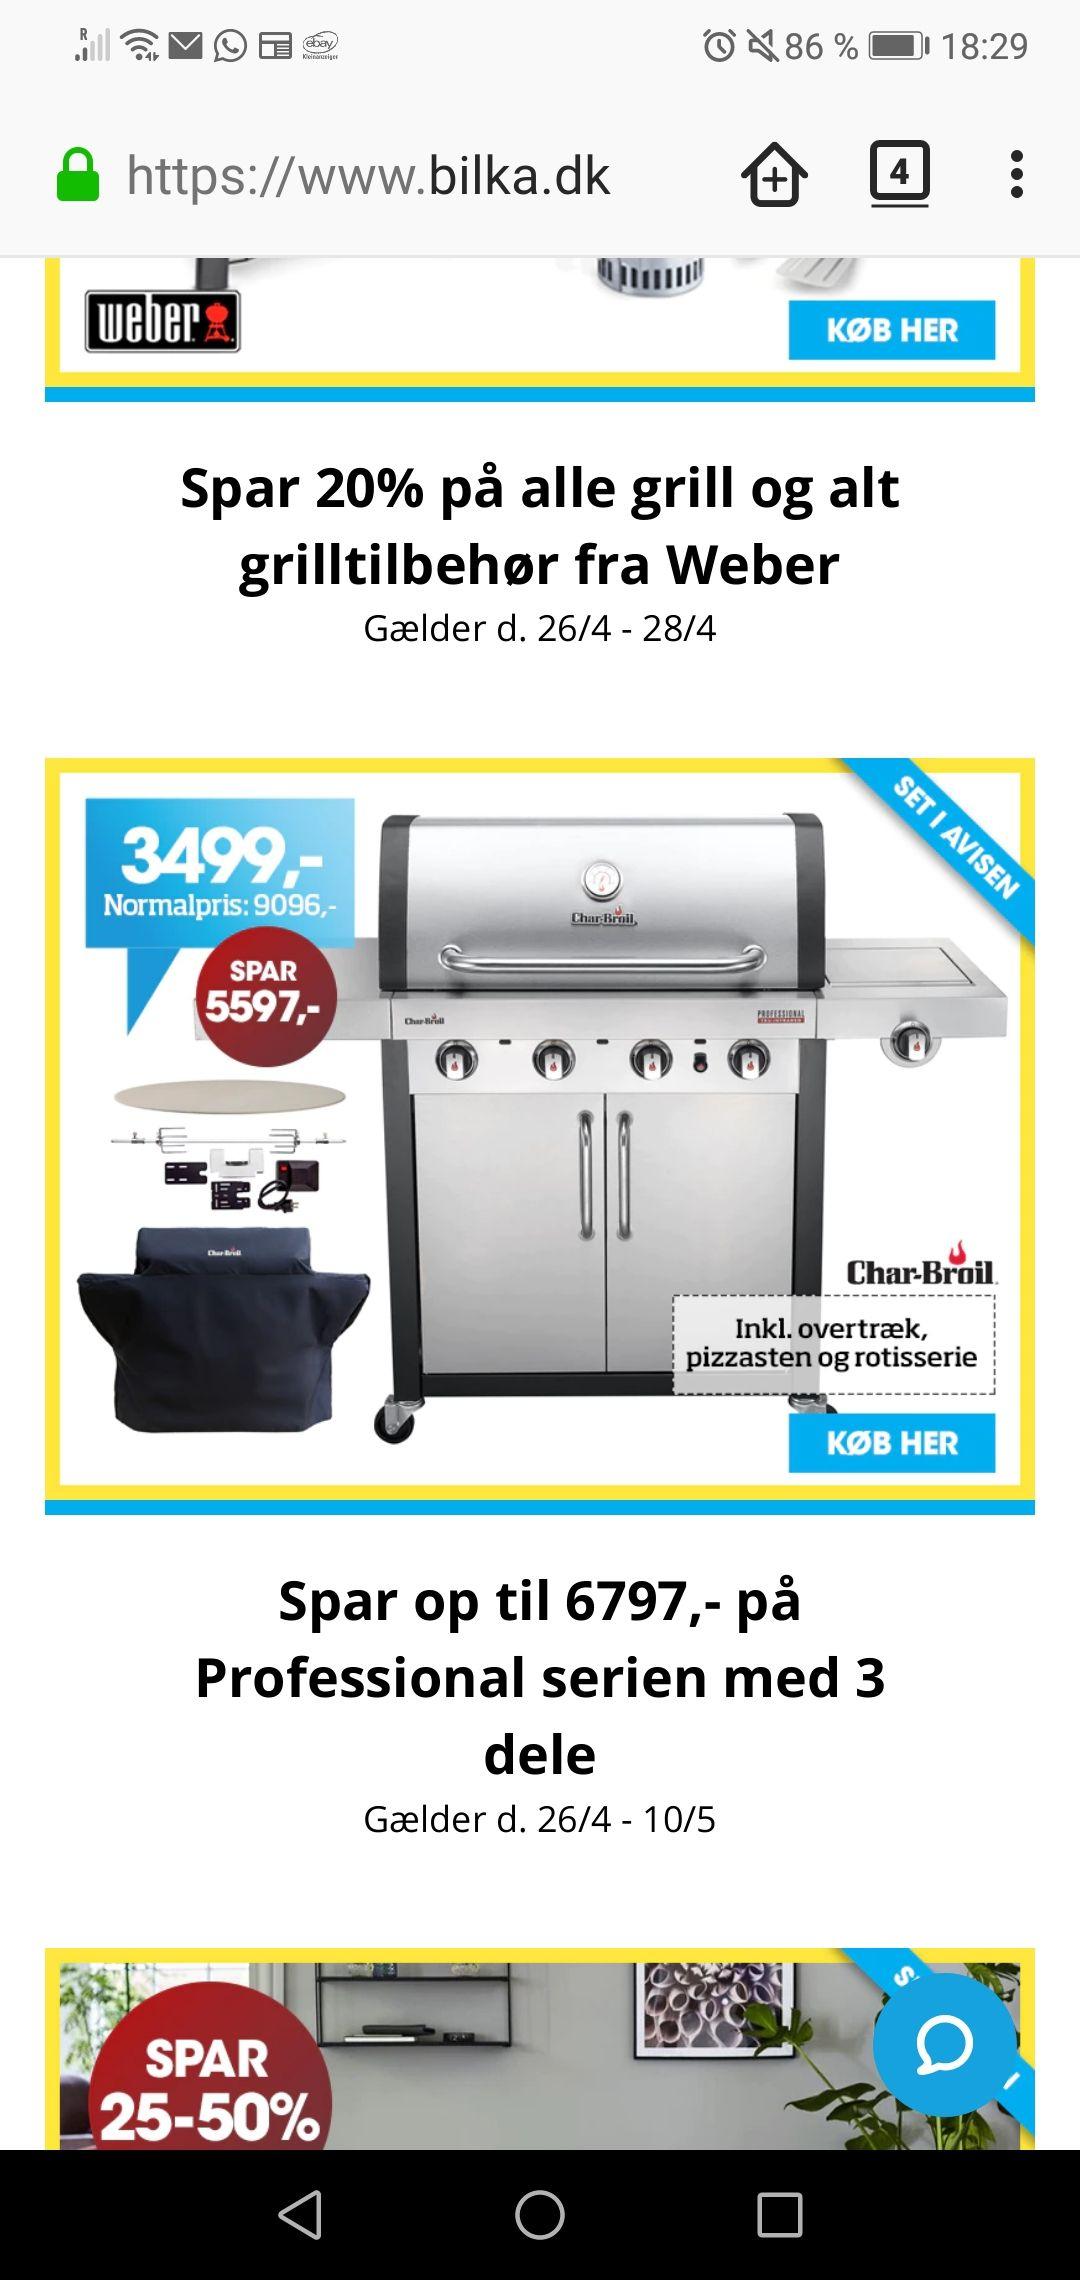 (Bilka in DK) Char-Broil Professional 4400